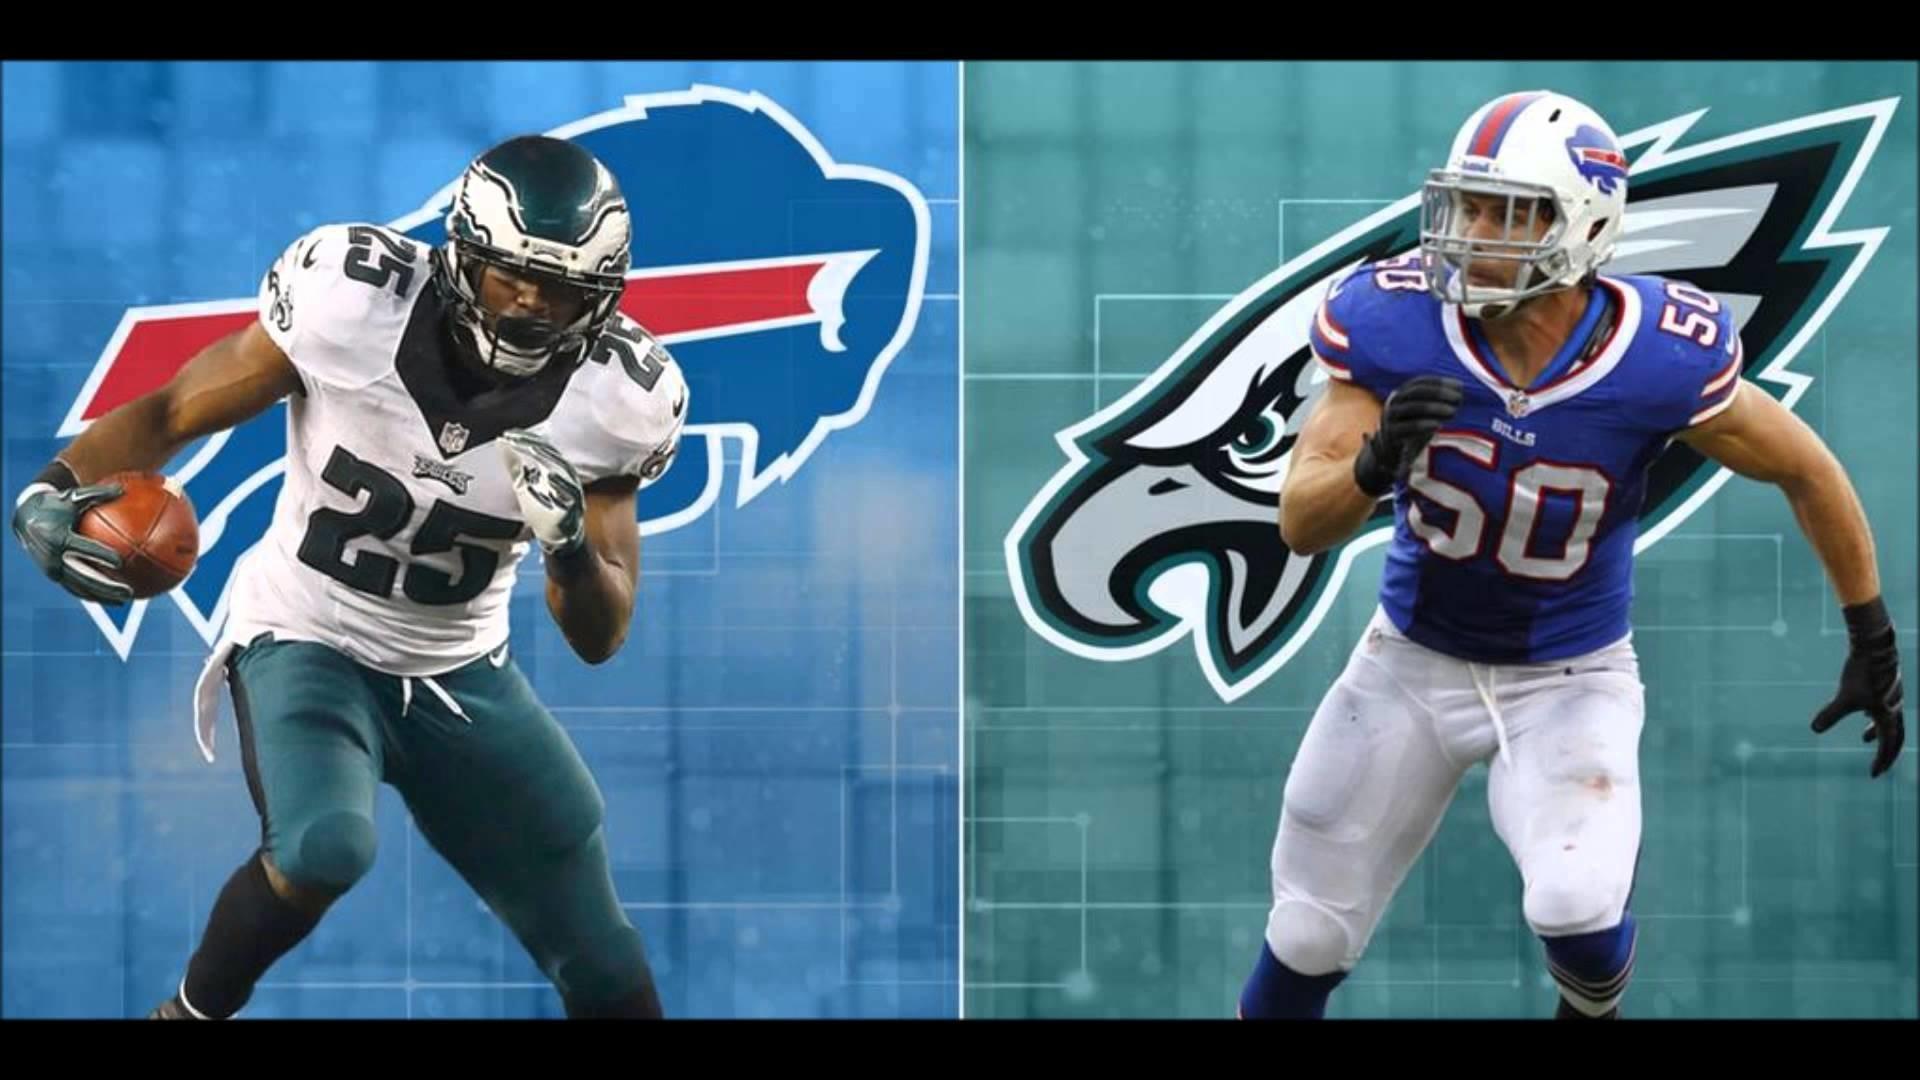 Eagles trade LeSean McCoy to Buffalo for LB Kiko Alonso